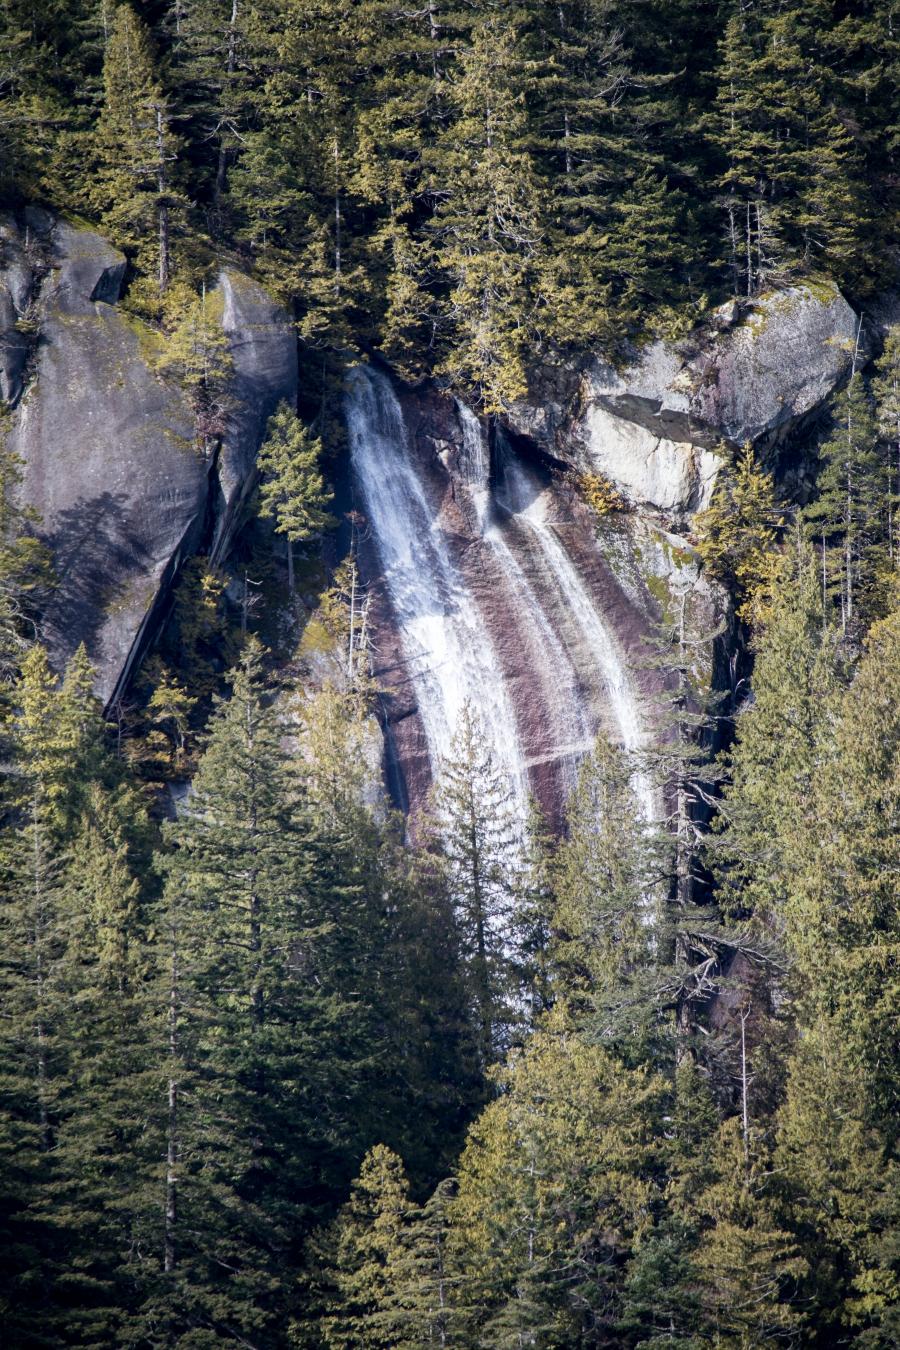 Squamish River Estuary, waterfall